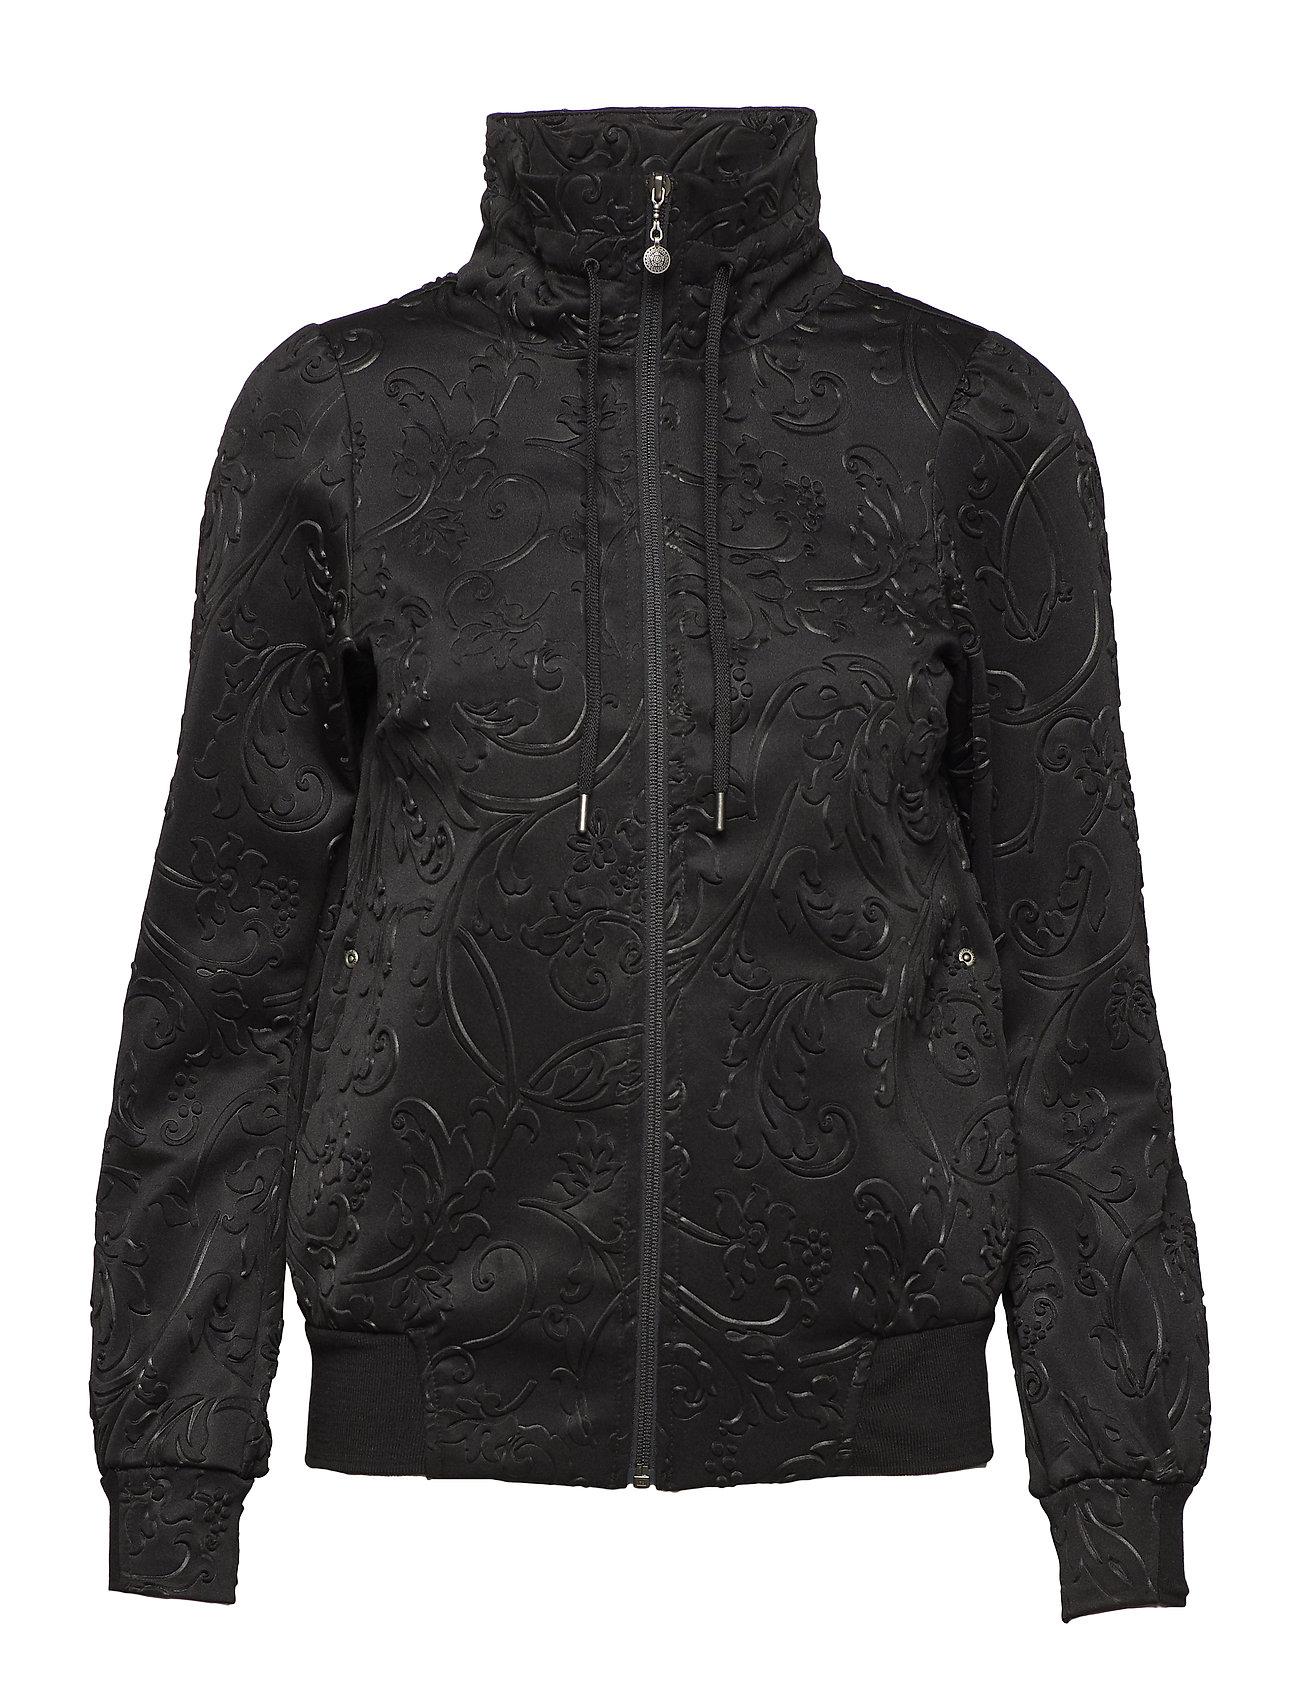 ODD MOLLY ACTIVE WEAR asphalt flower jacket